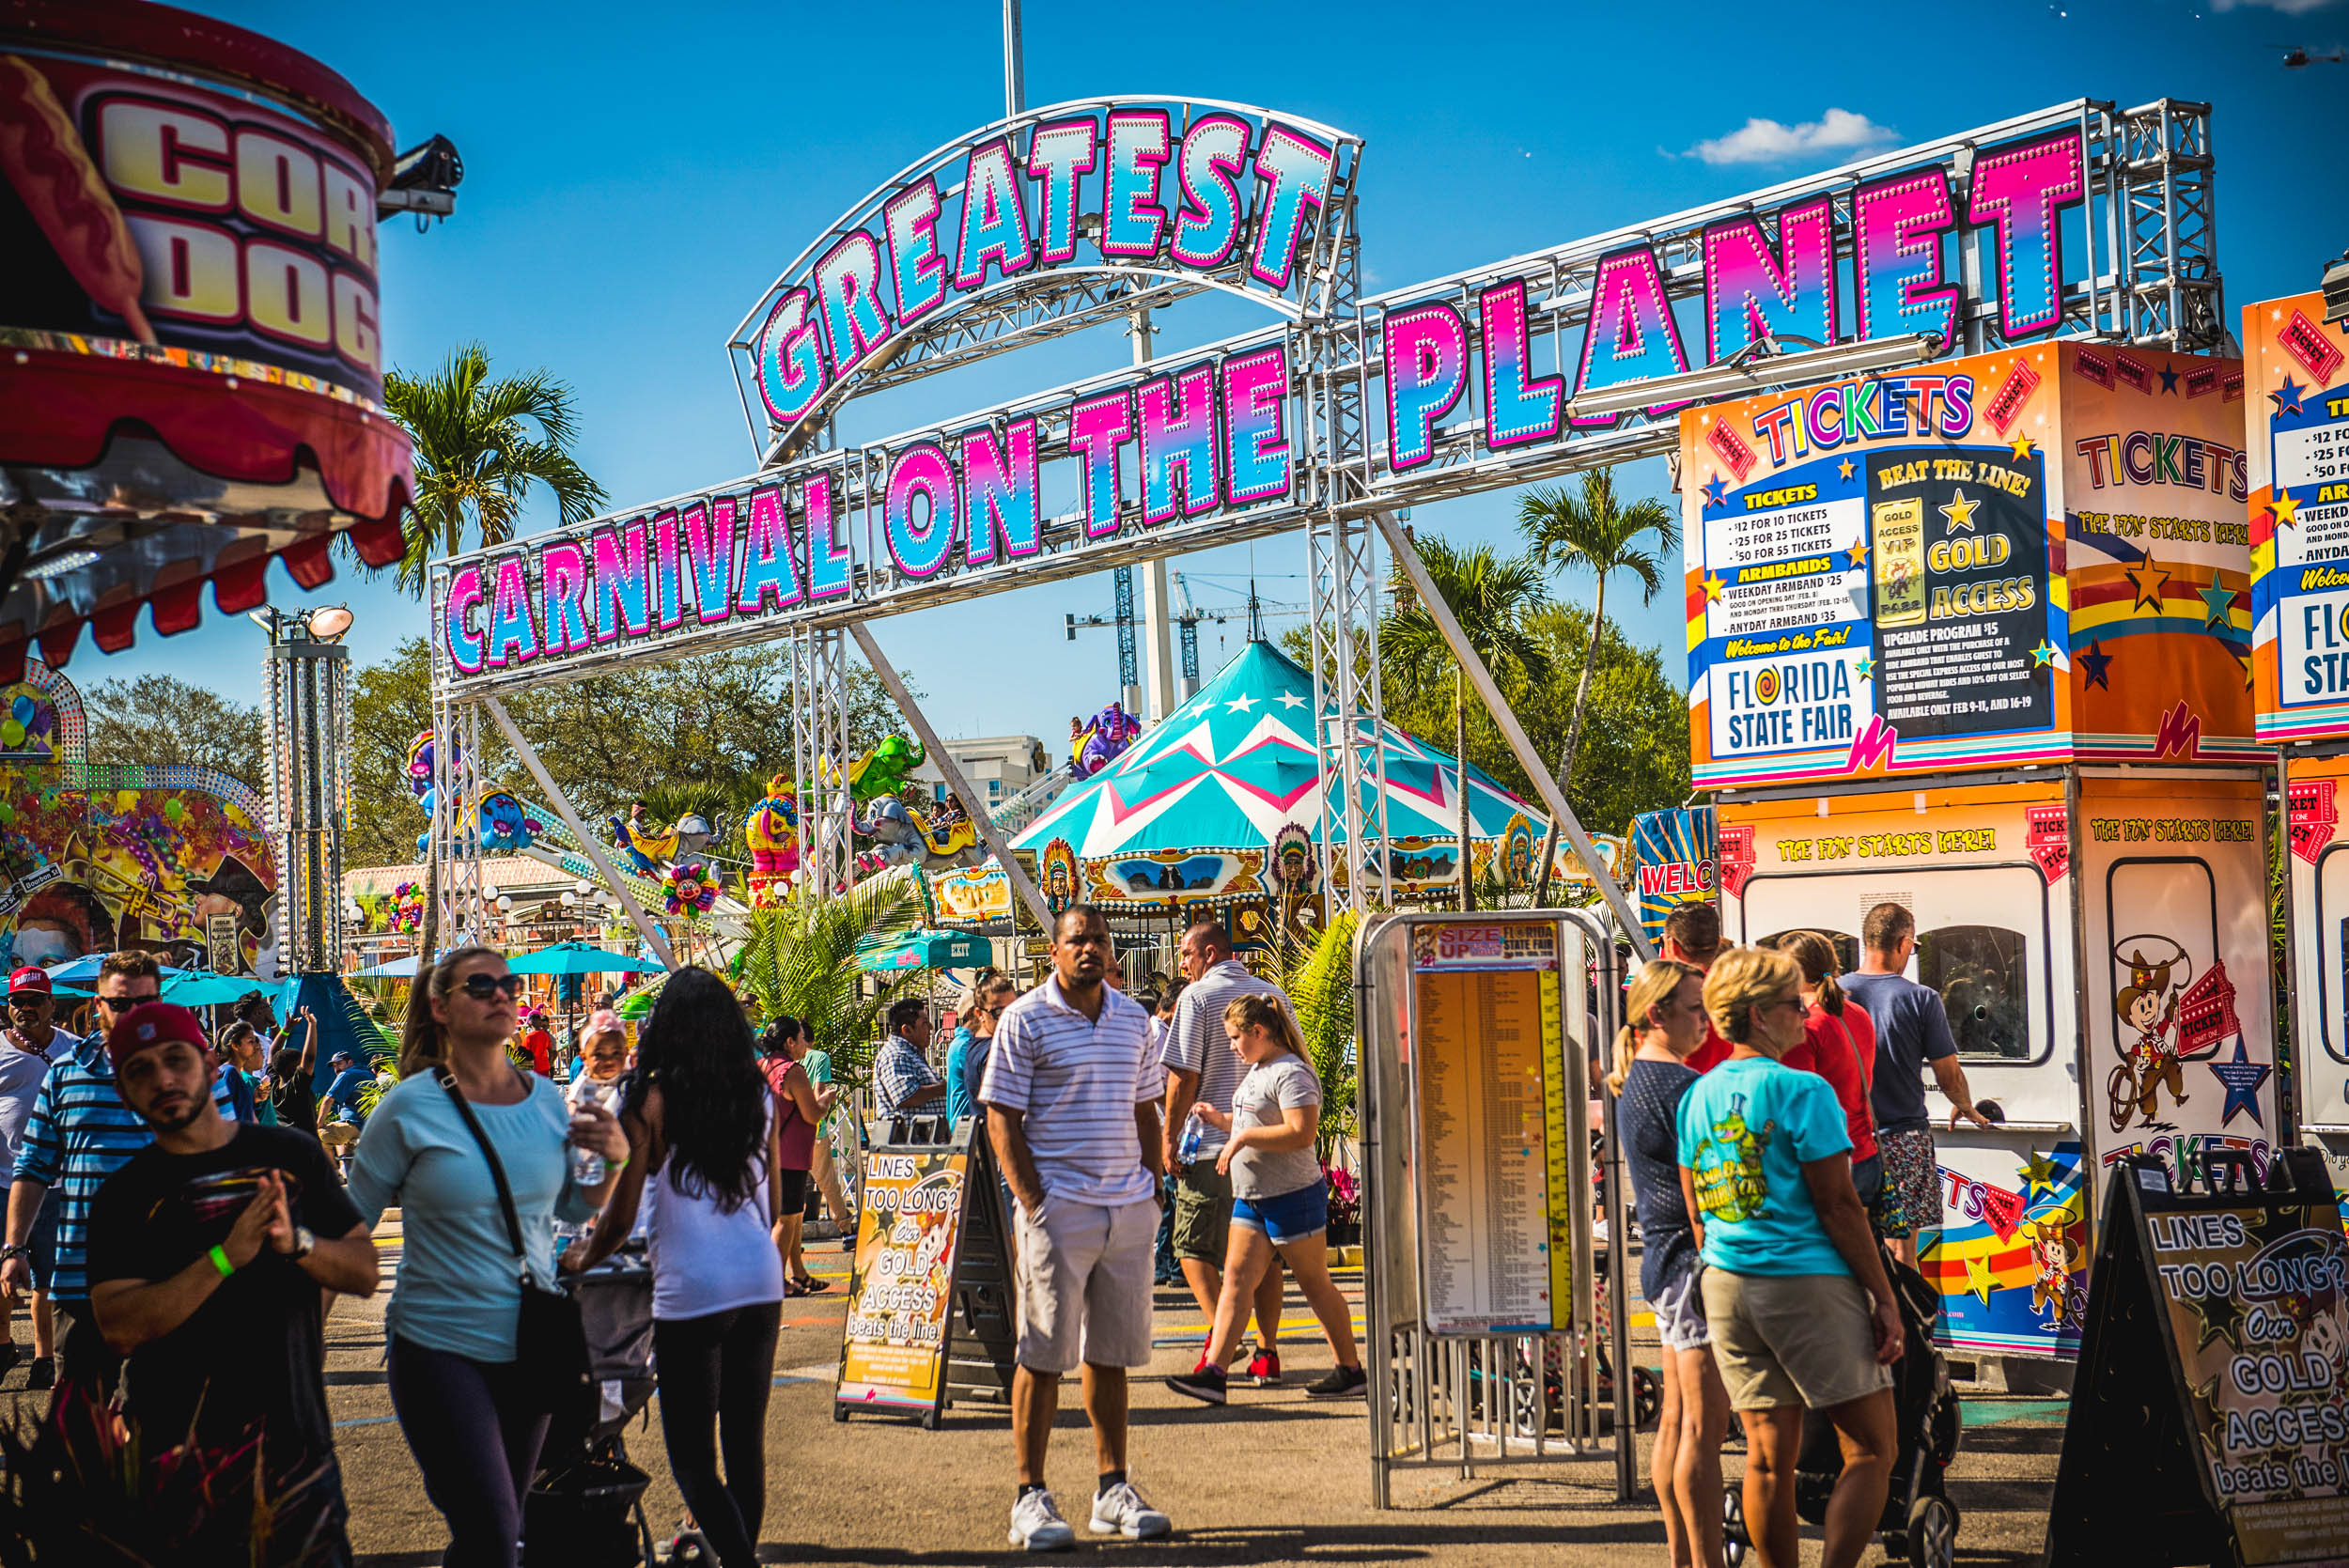 Vendors - Florida State Fair in Florida State Fairgrounds Events 2021